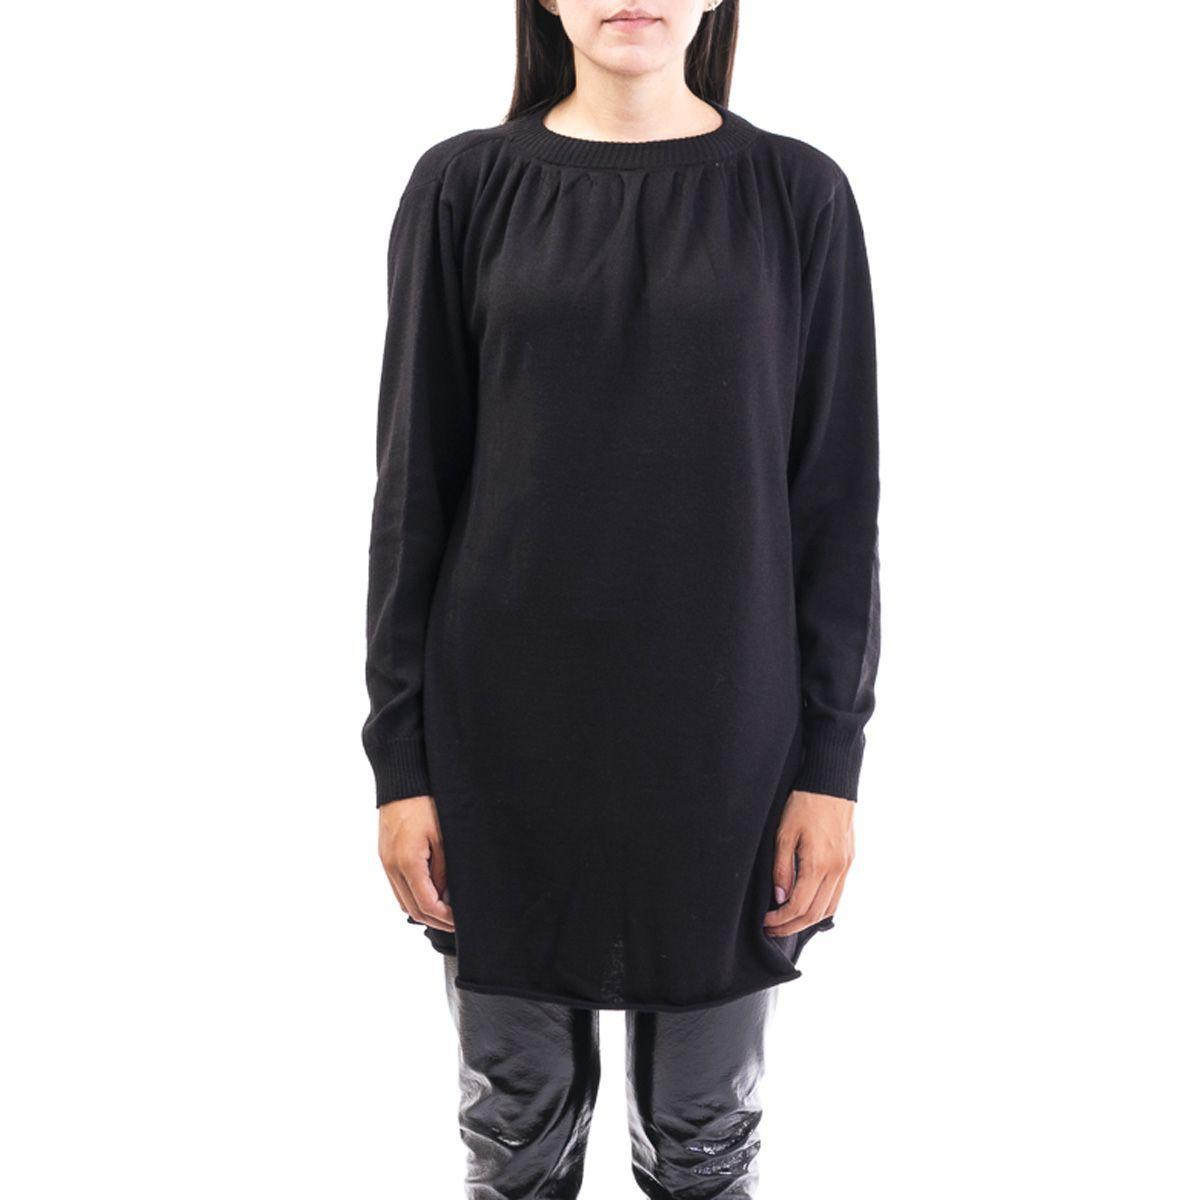 LIVIANA CONTI WOMEN'S F9AA20Y690 BLACK WOOL DRESS